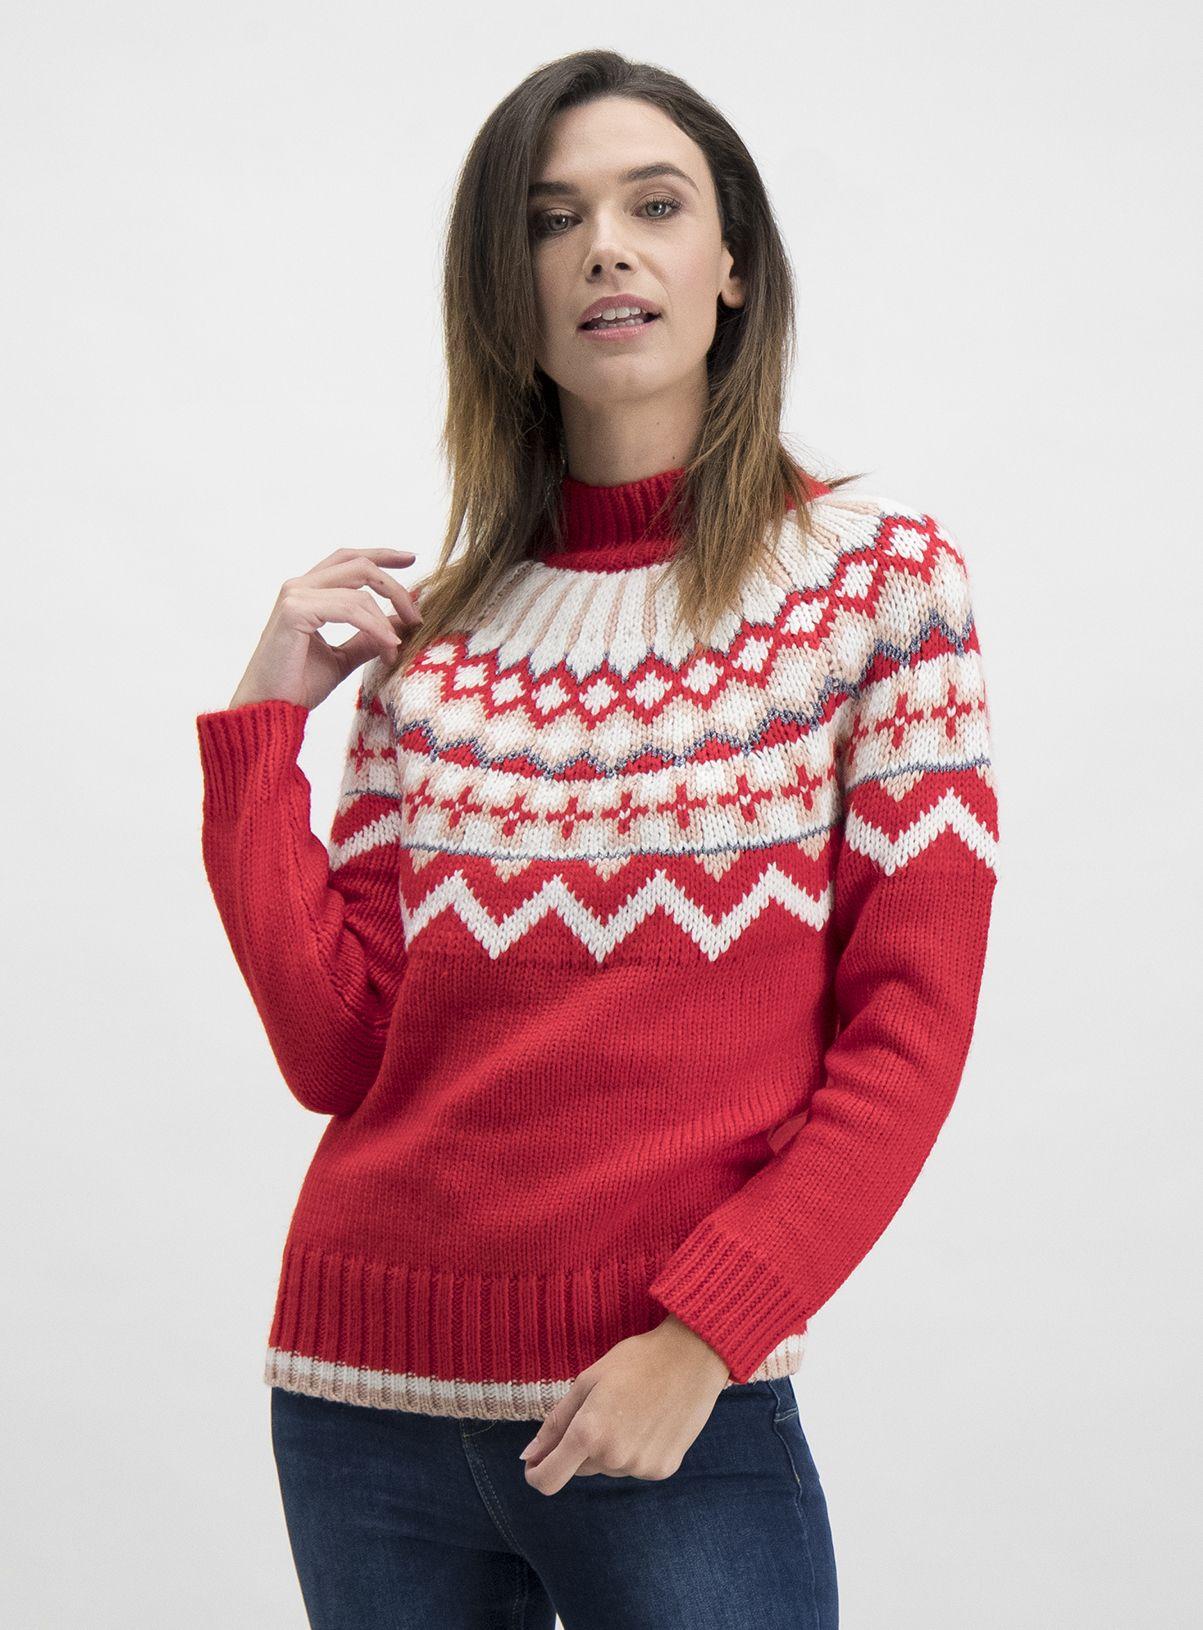 SKU XM CHUNKY FAIRISLE YOKE JUMPER AW19Red Knit jumper